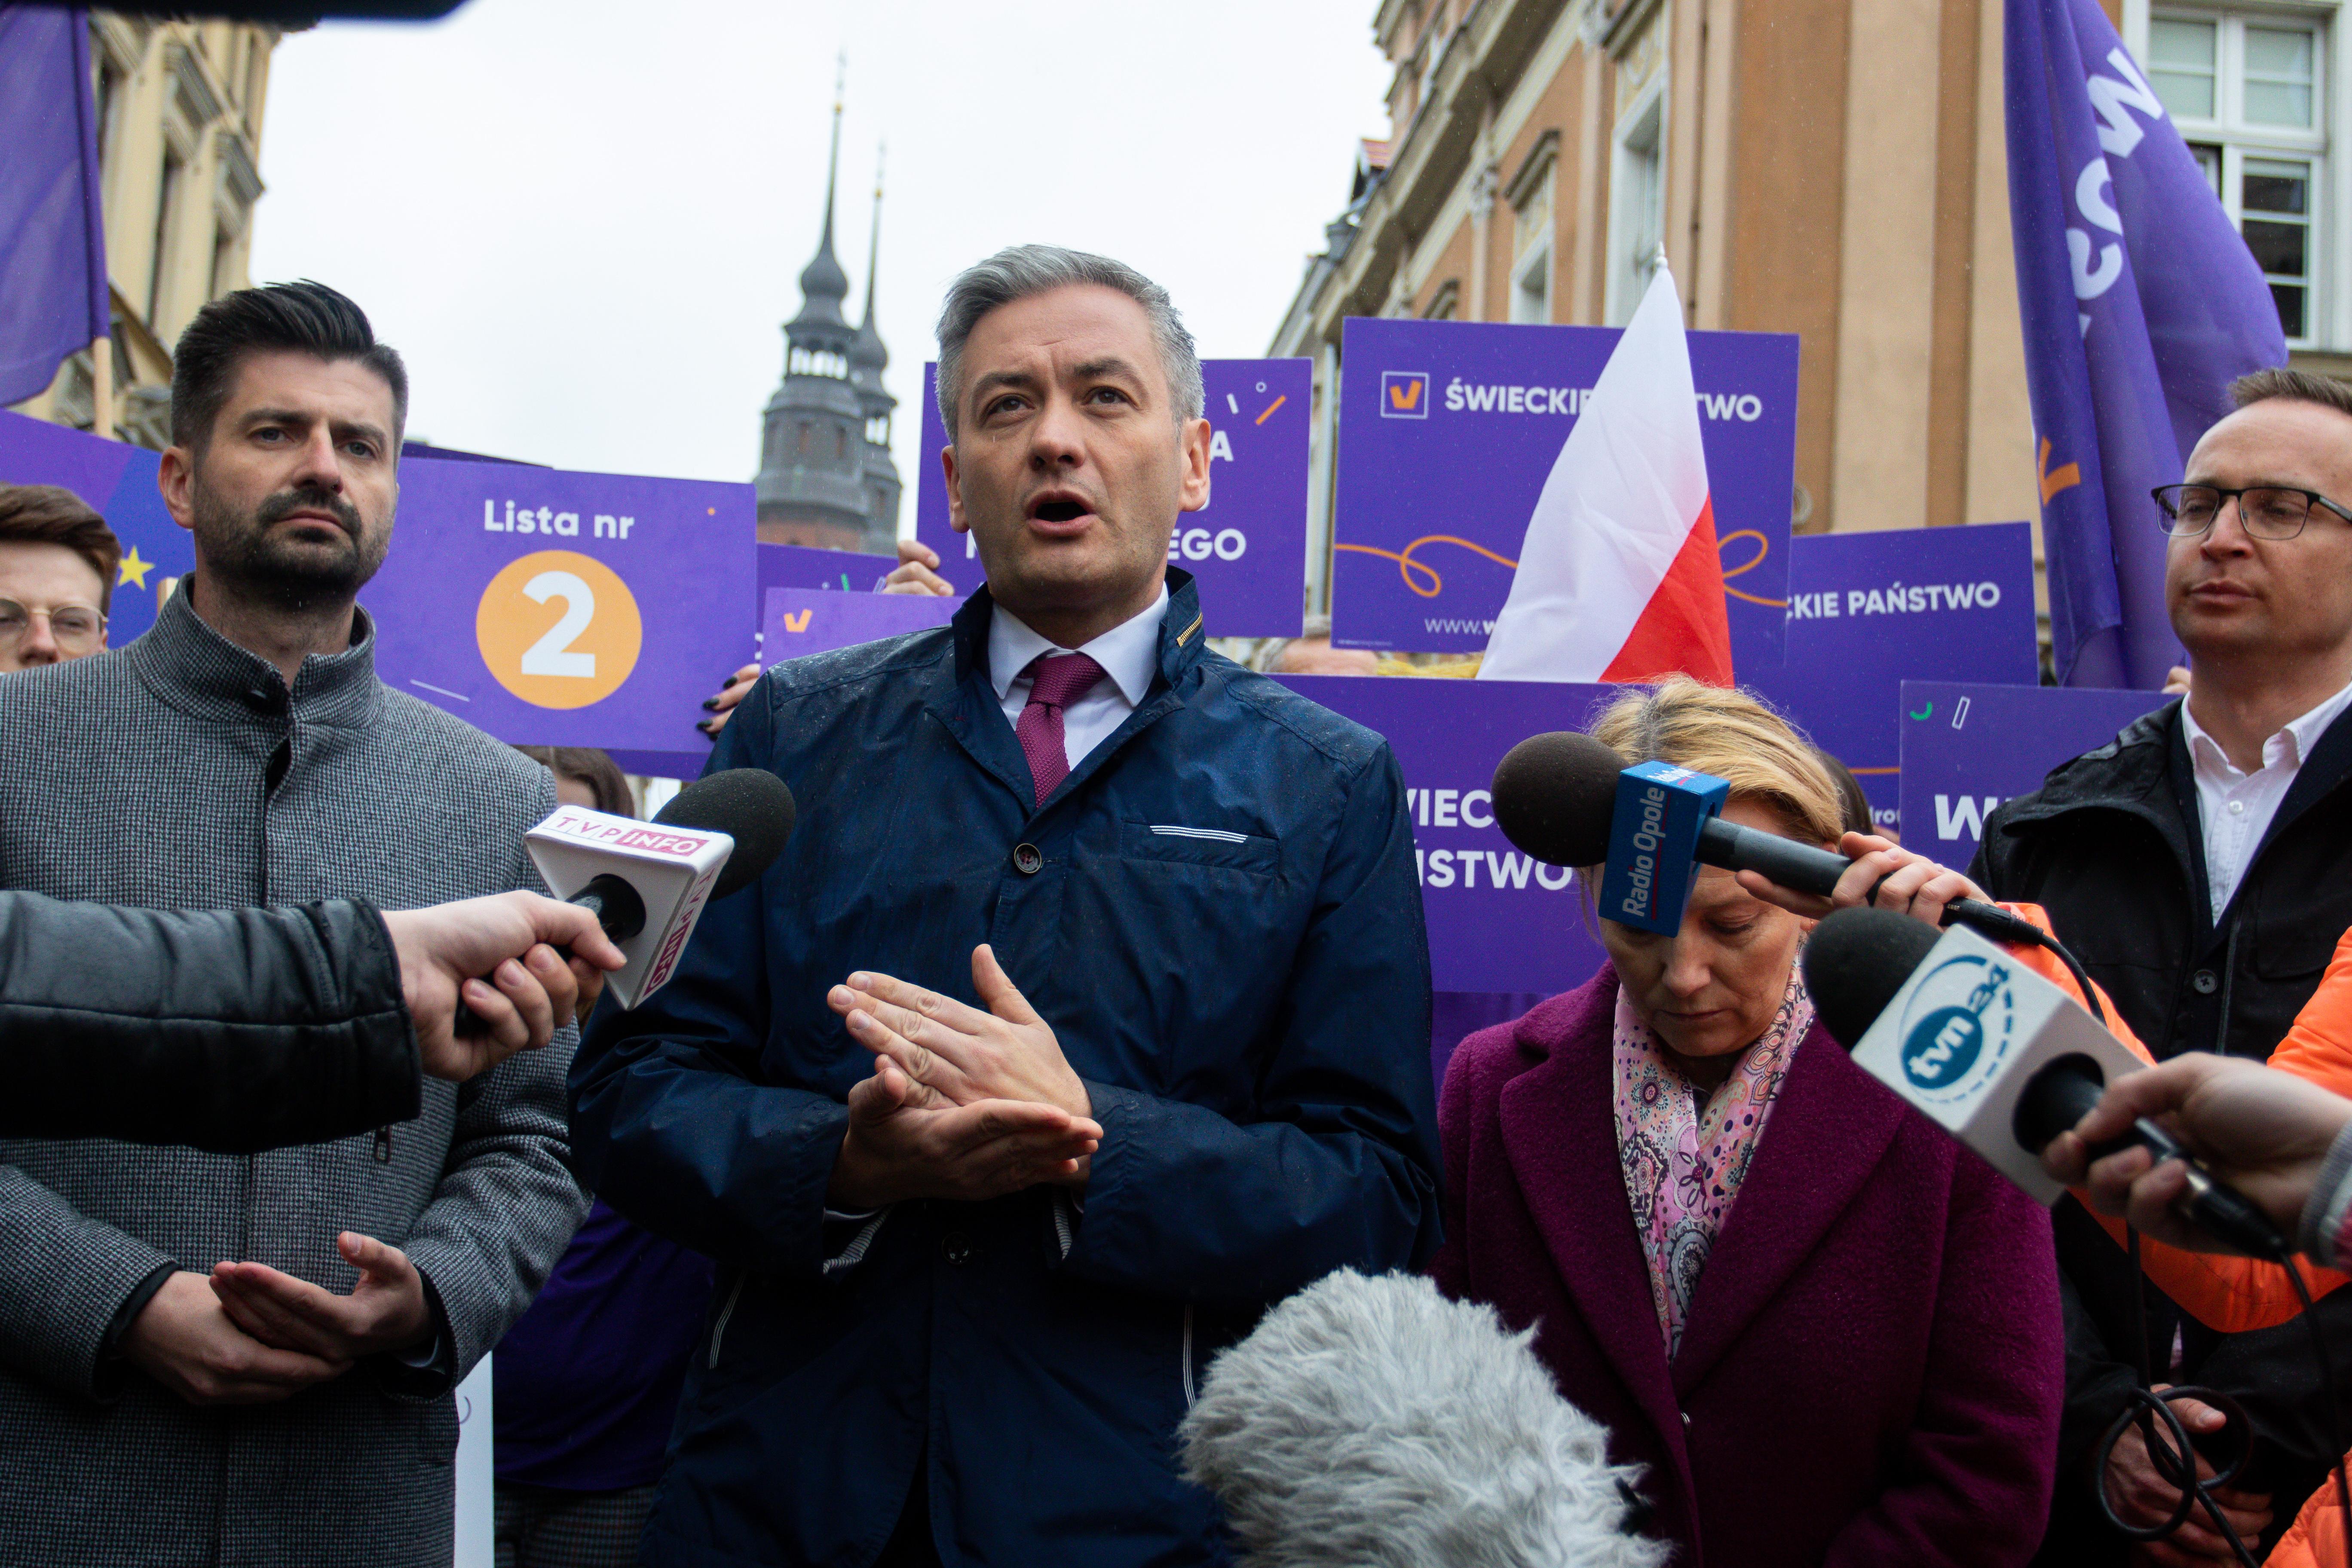 Lider partii Wiosna Robert Biedroń